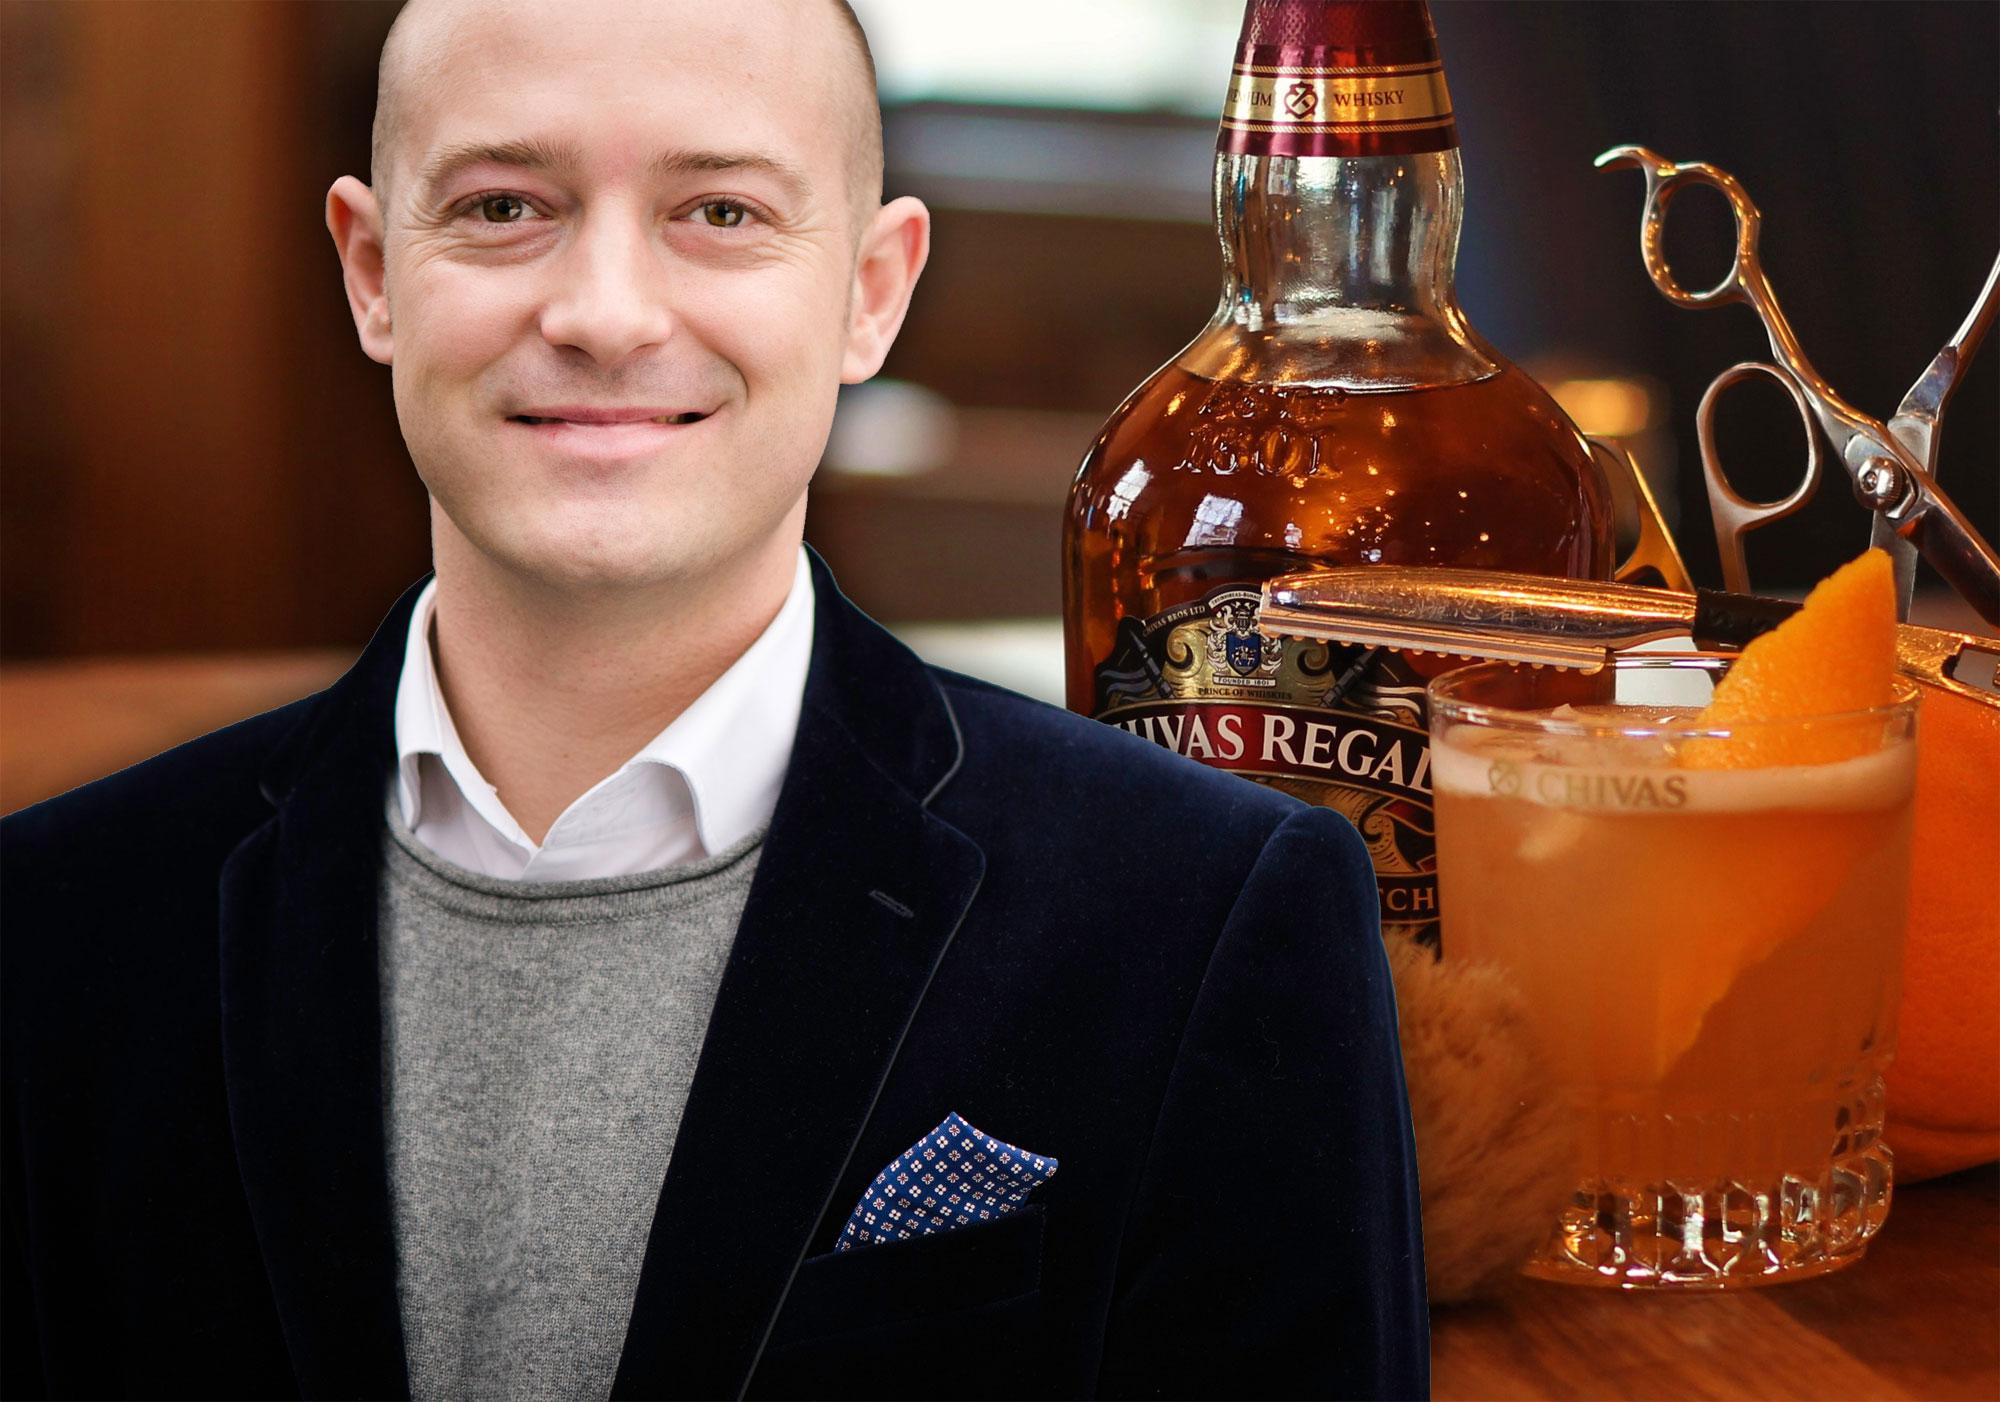 We Meet Max Warner, International Brand Ambassador For Chivas Regal Whisky